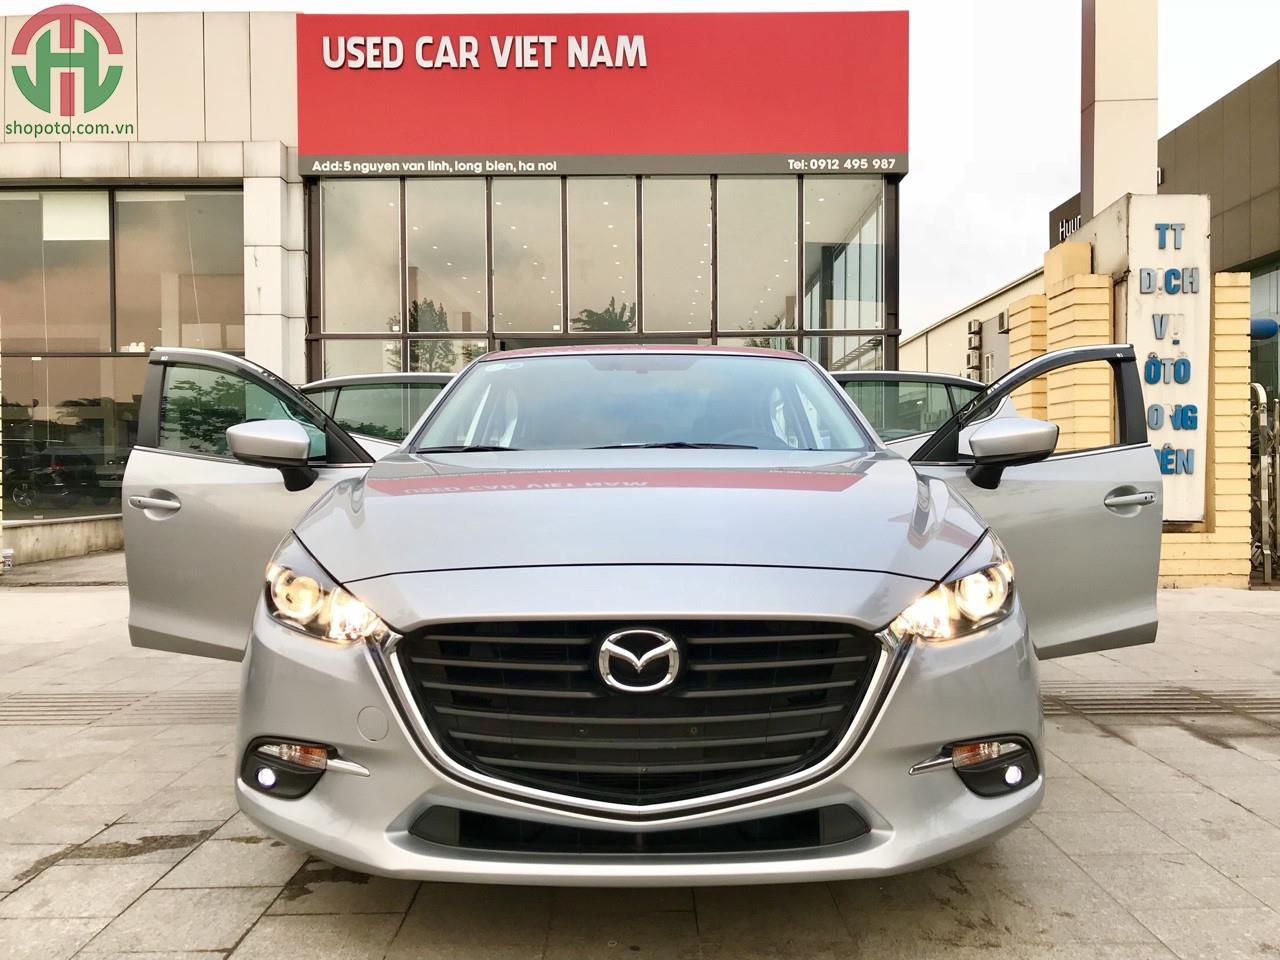 Mazda 3 1.5 AT 2017 Facelift màu Bạc